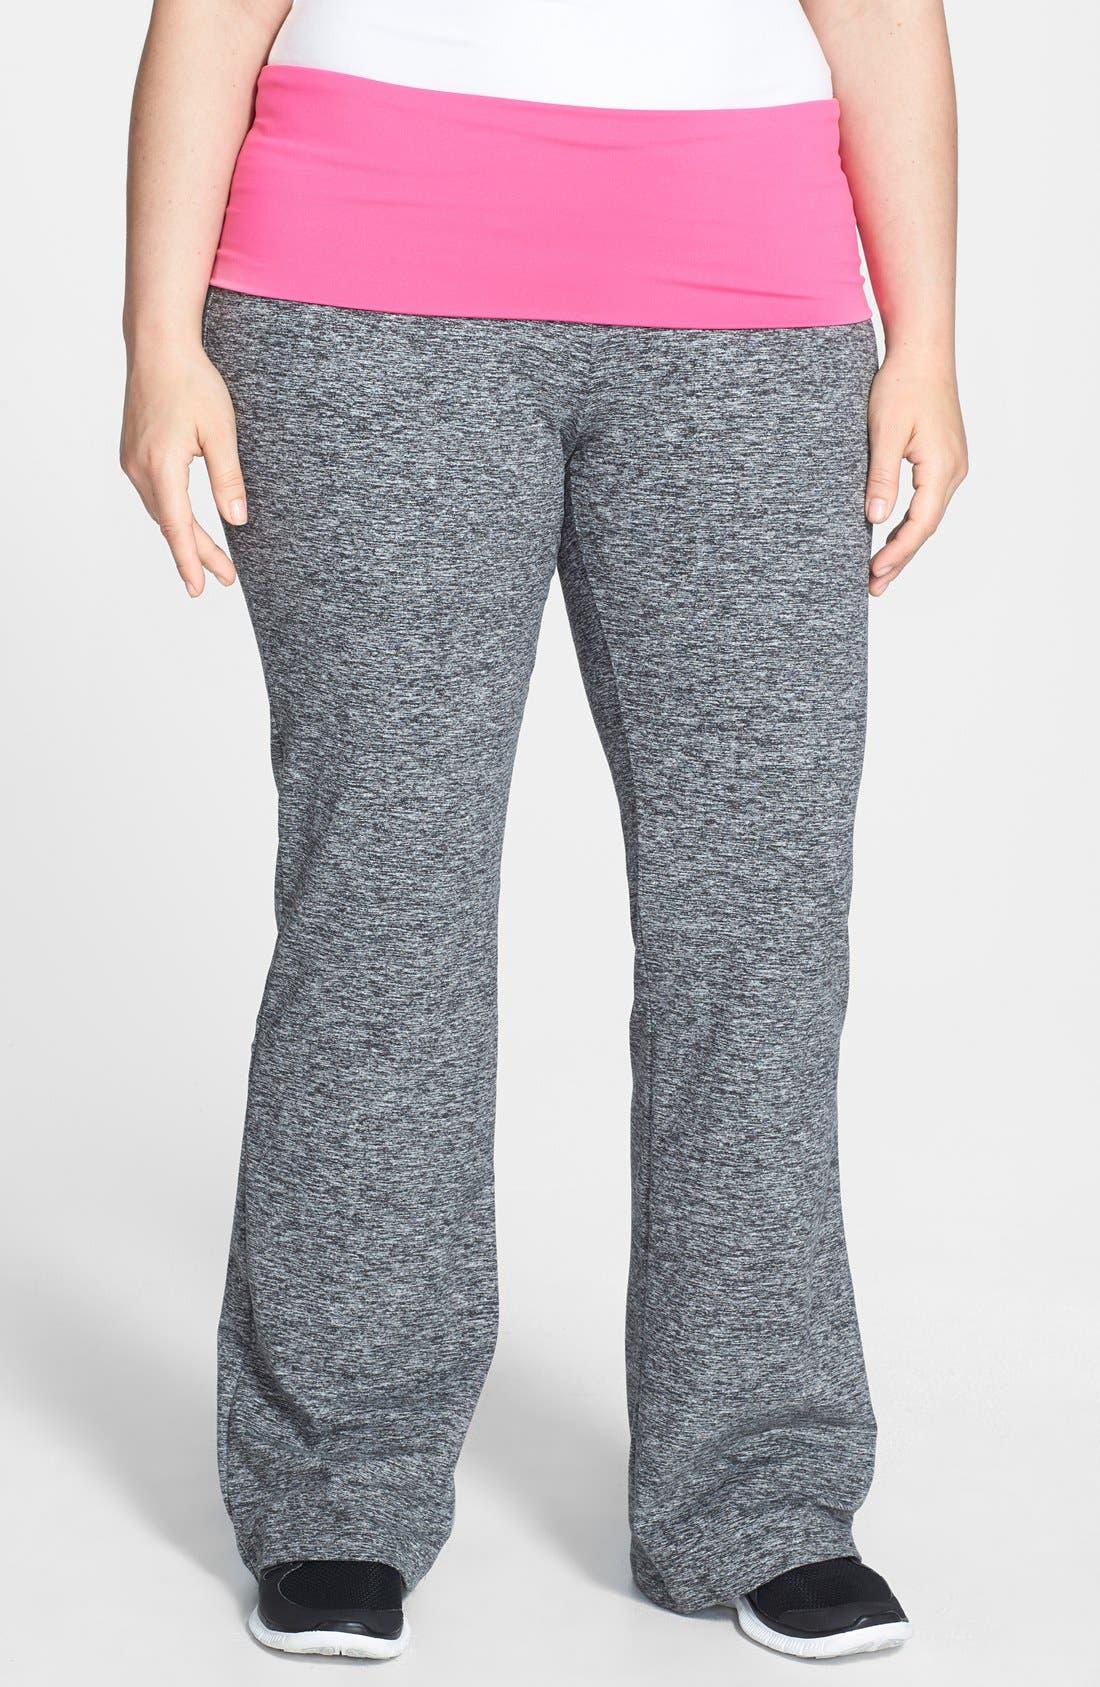 Alternate Image 1 Selected - Pink Lotus Contrast Waist Compression Yoga Pants (Plus Size)